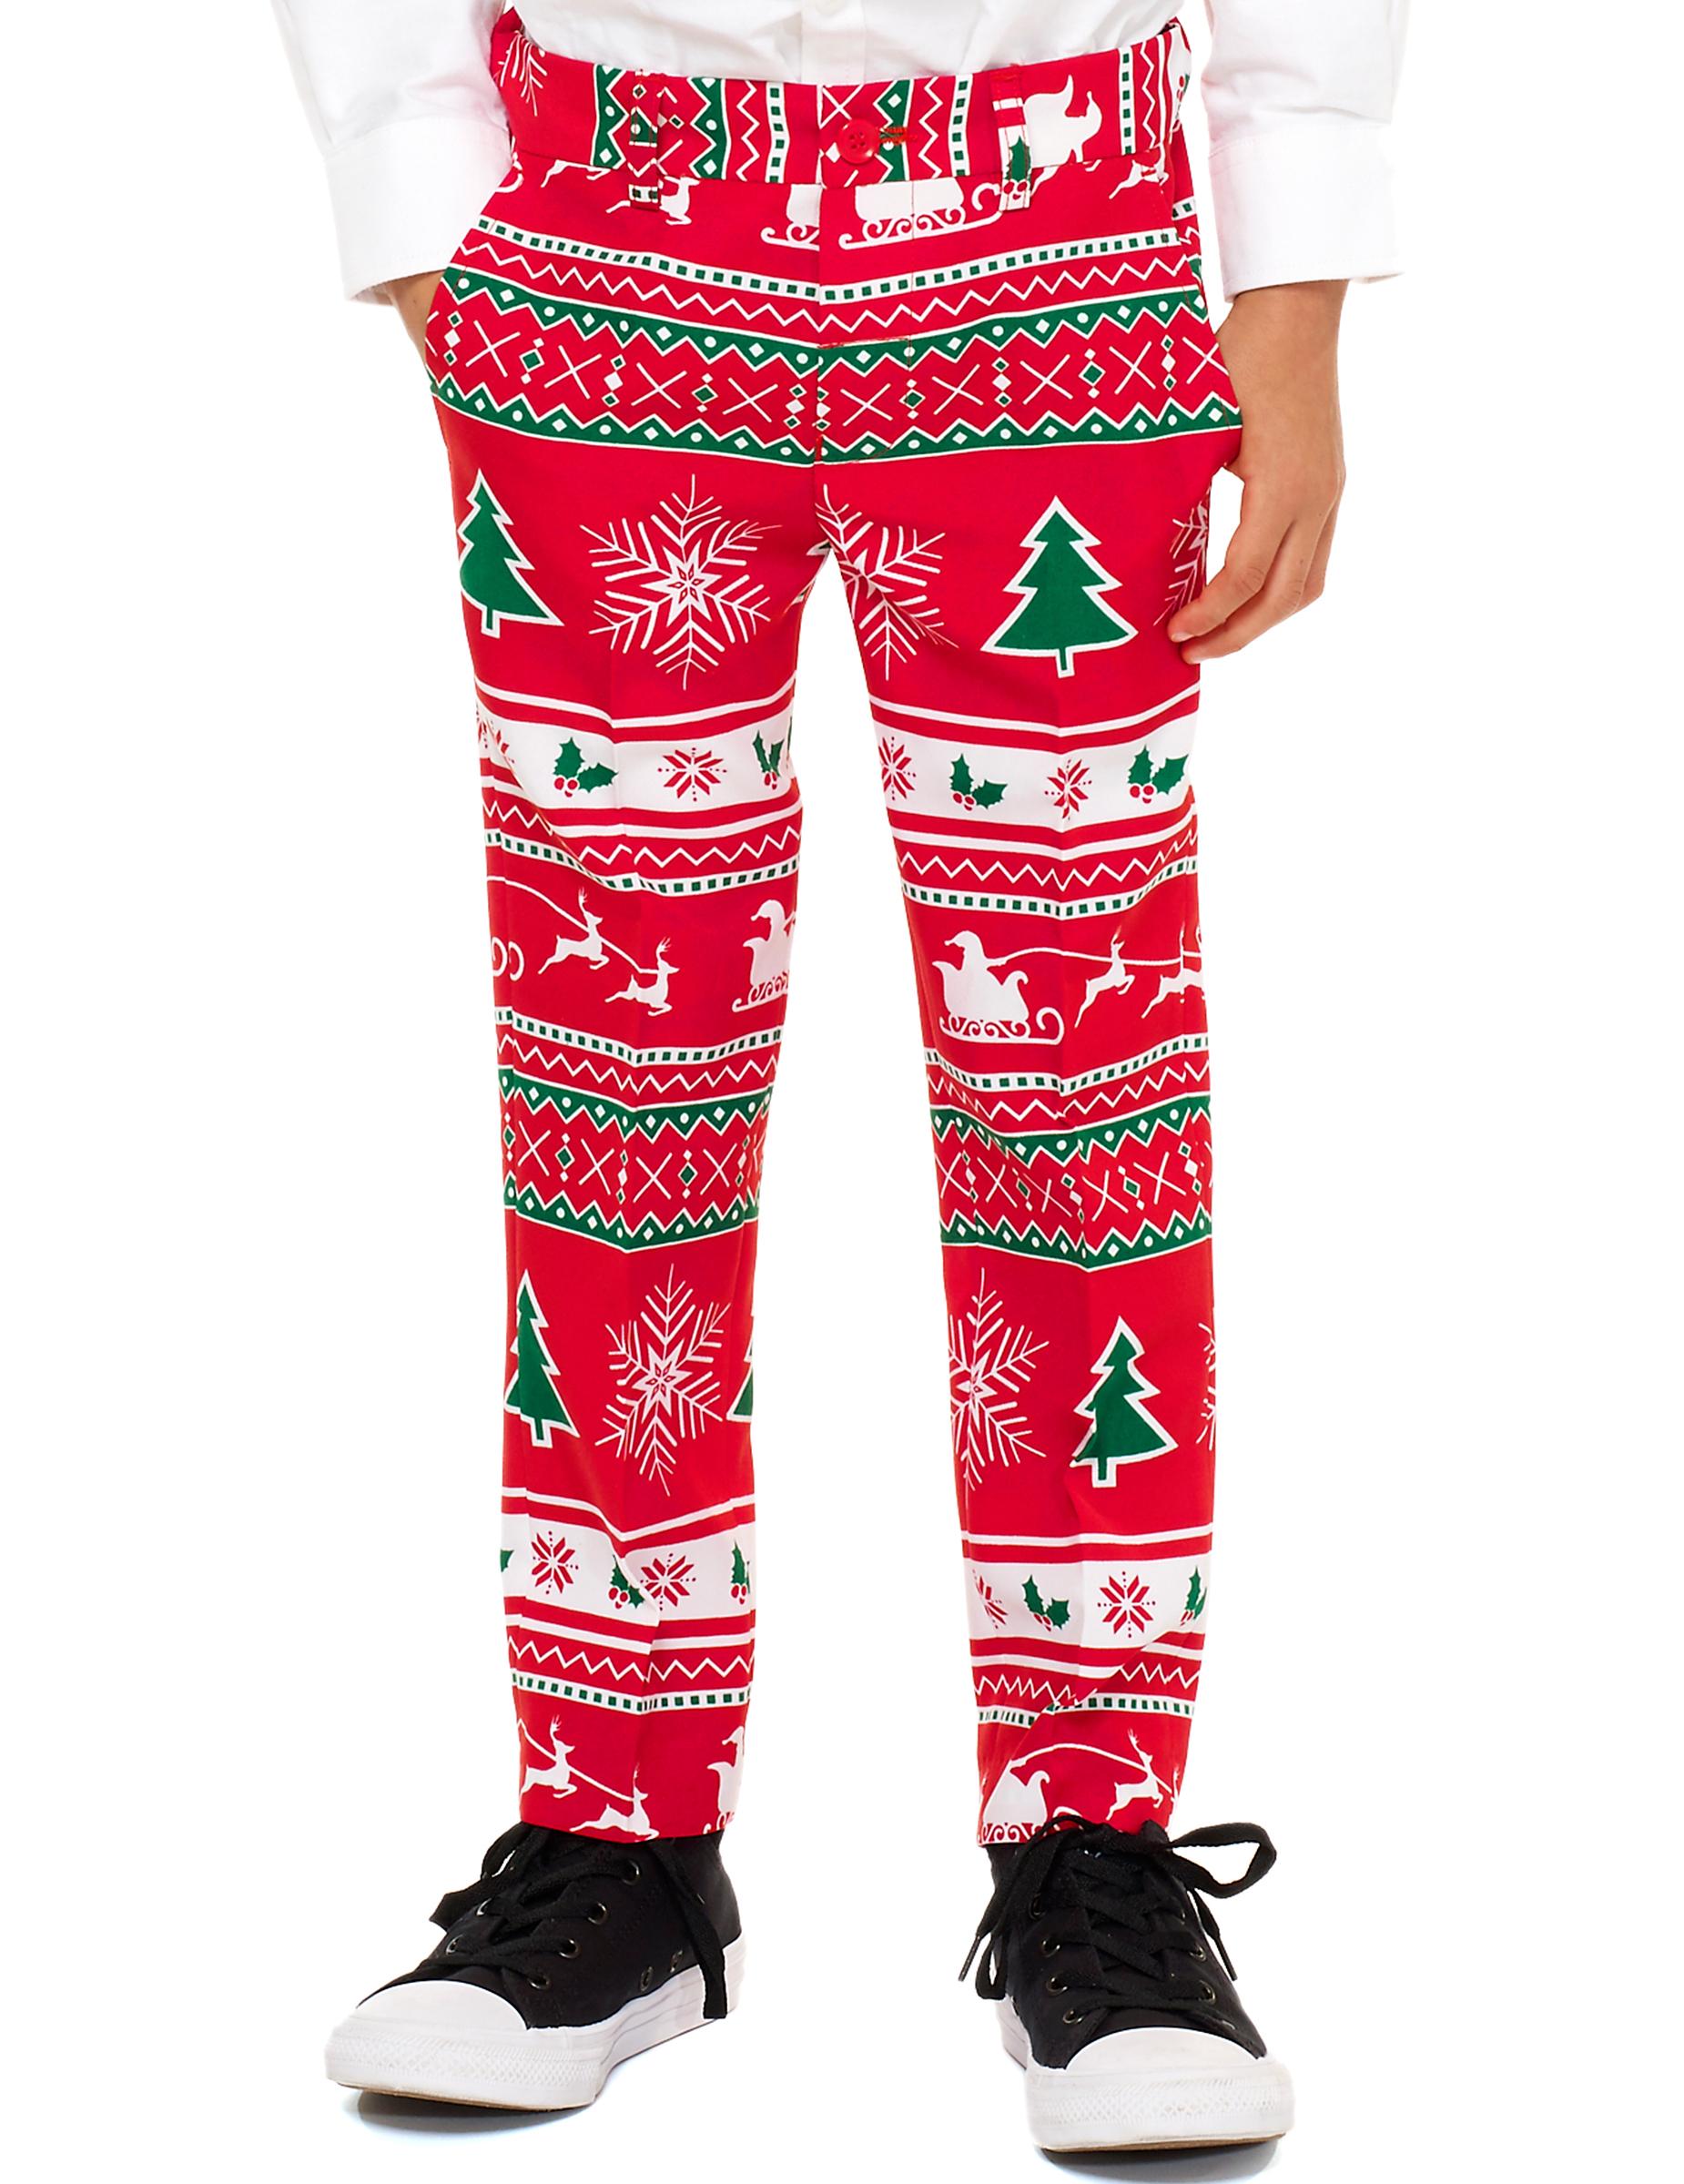 2a2eb129c Traje Mr. Winterwonderland niño Navidad de Opposuits  Disfraces ...